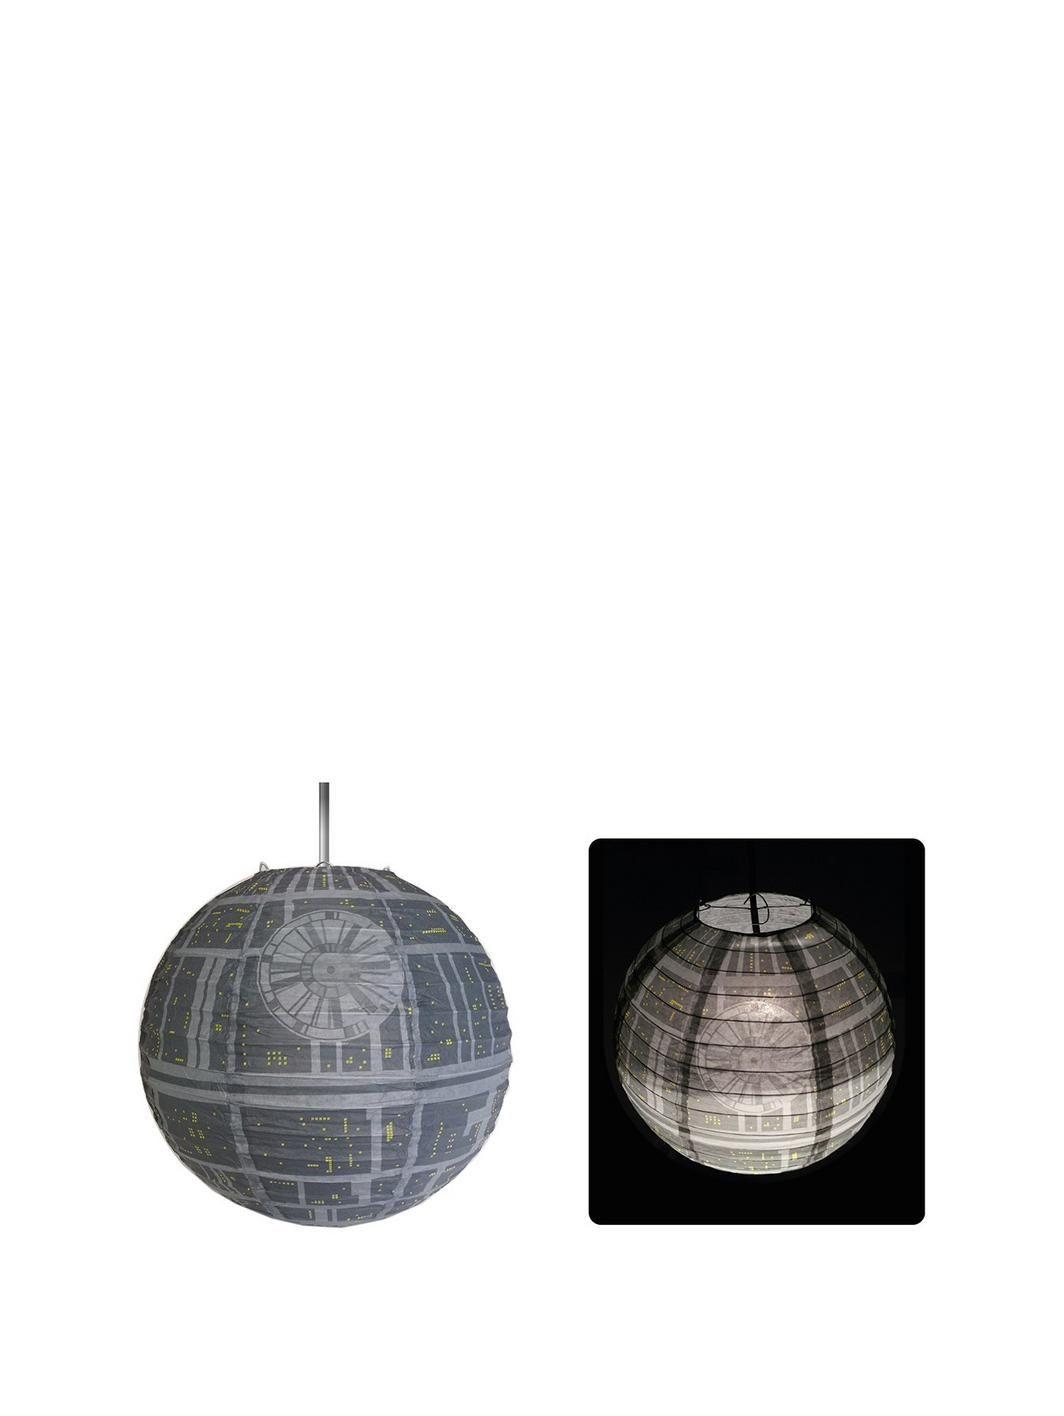 Star Wars Lamp Shade